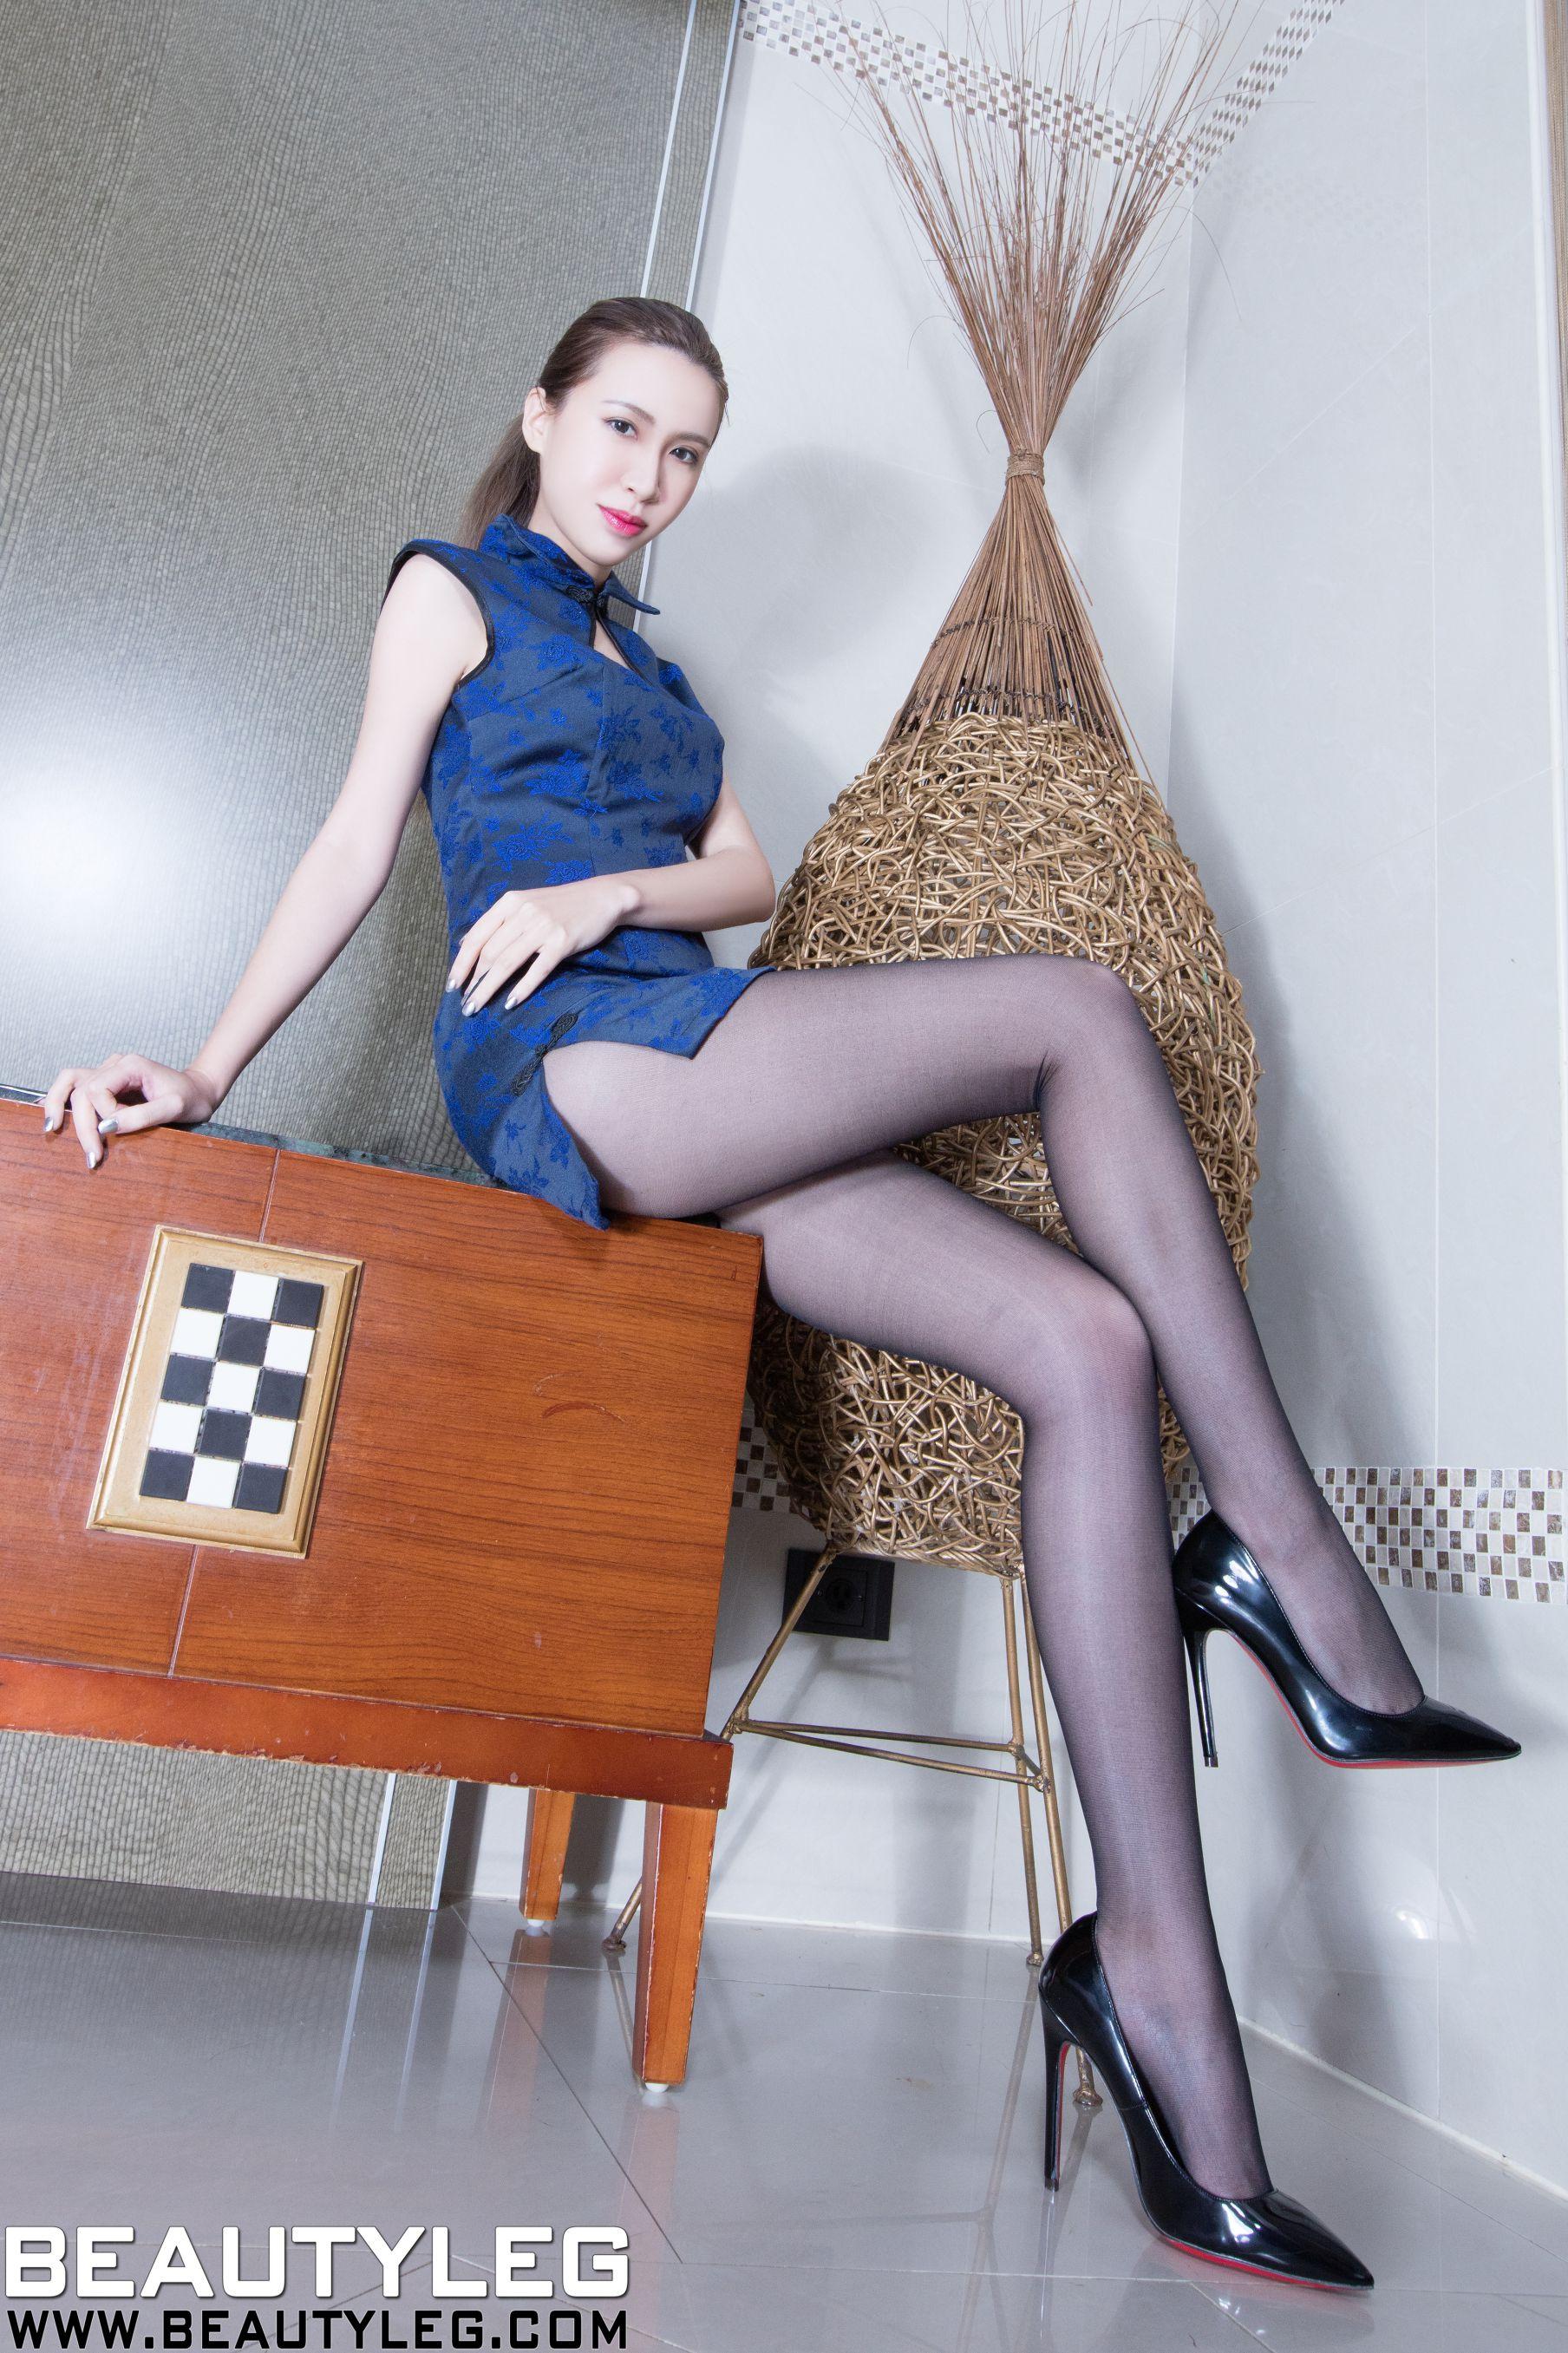 VOL.1398 [Beautyleg]美腿情趣丝袜:崔多朵(崔德蓉,腿模Stephy)高品质写真套图(43P)